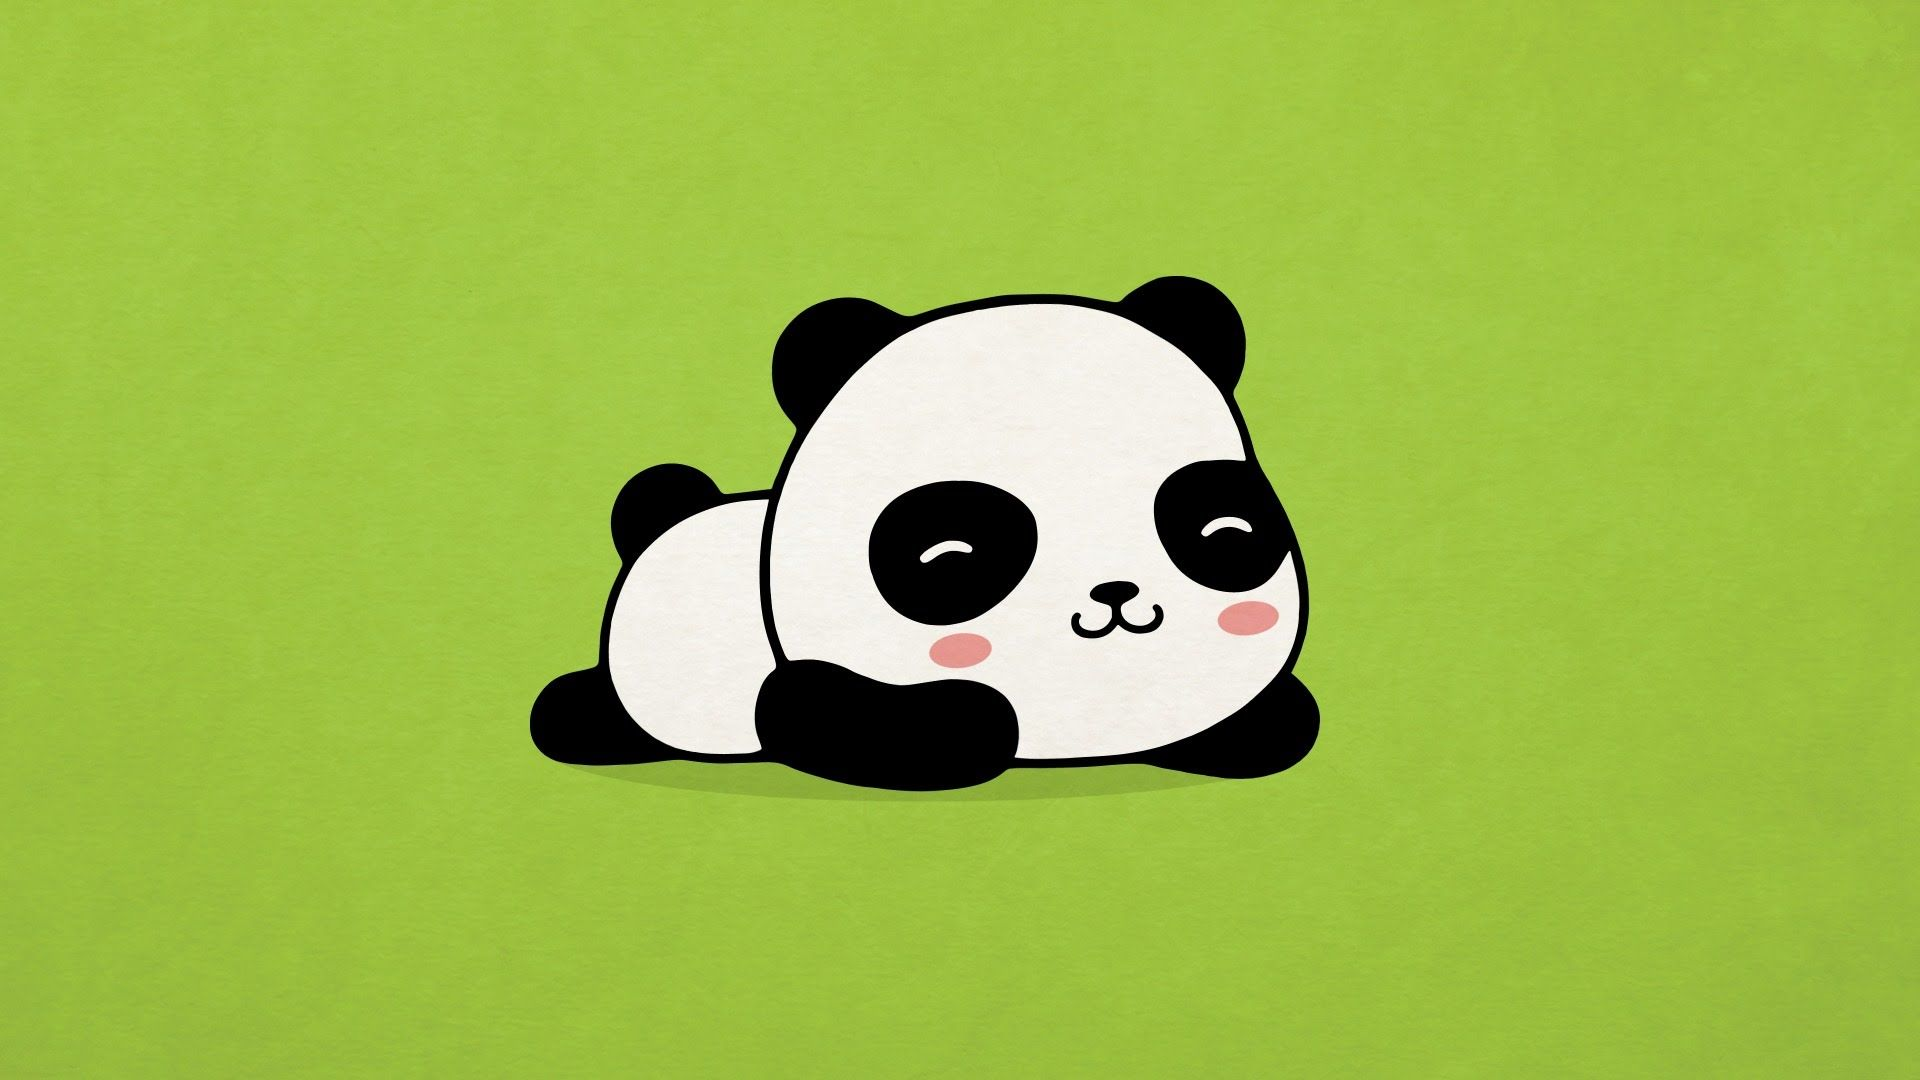 How To Draw A Cute Sleepy Panda Youtube Cute Panda Drawing Panda Wallpapers Panda Drawing